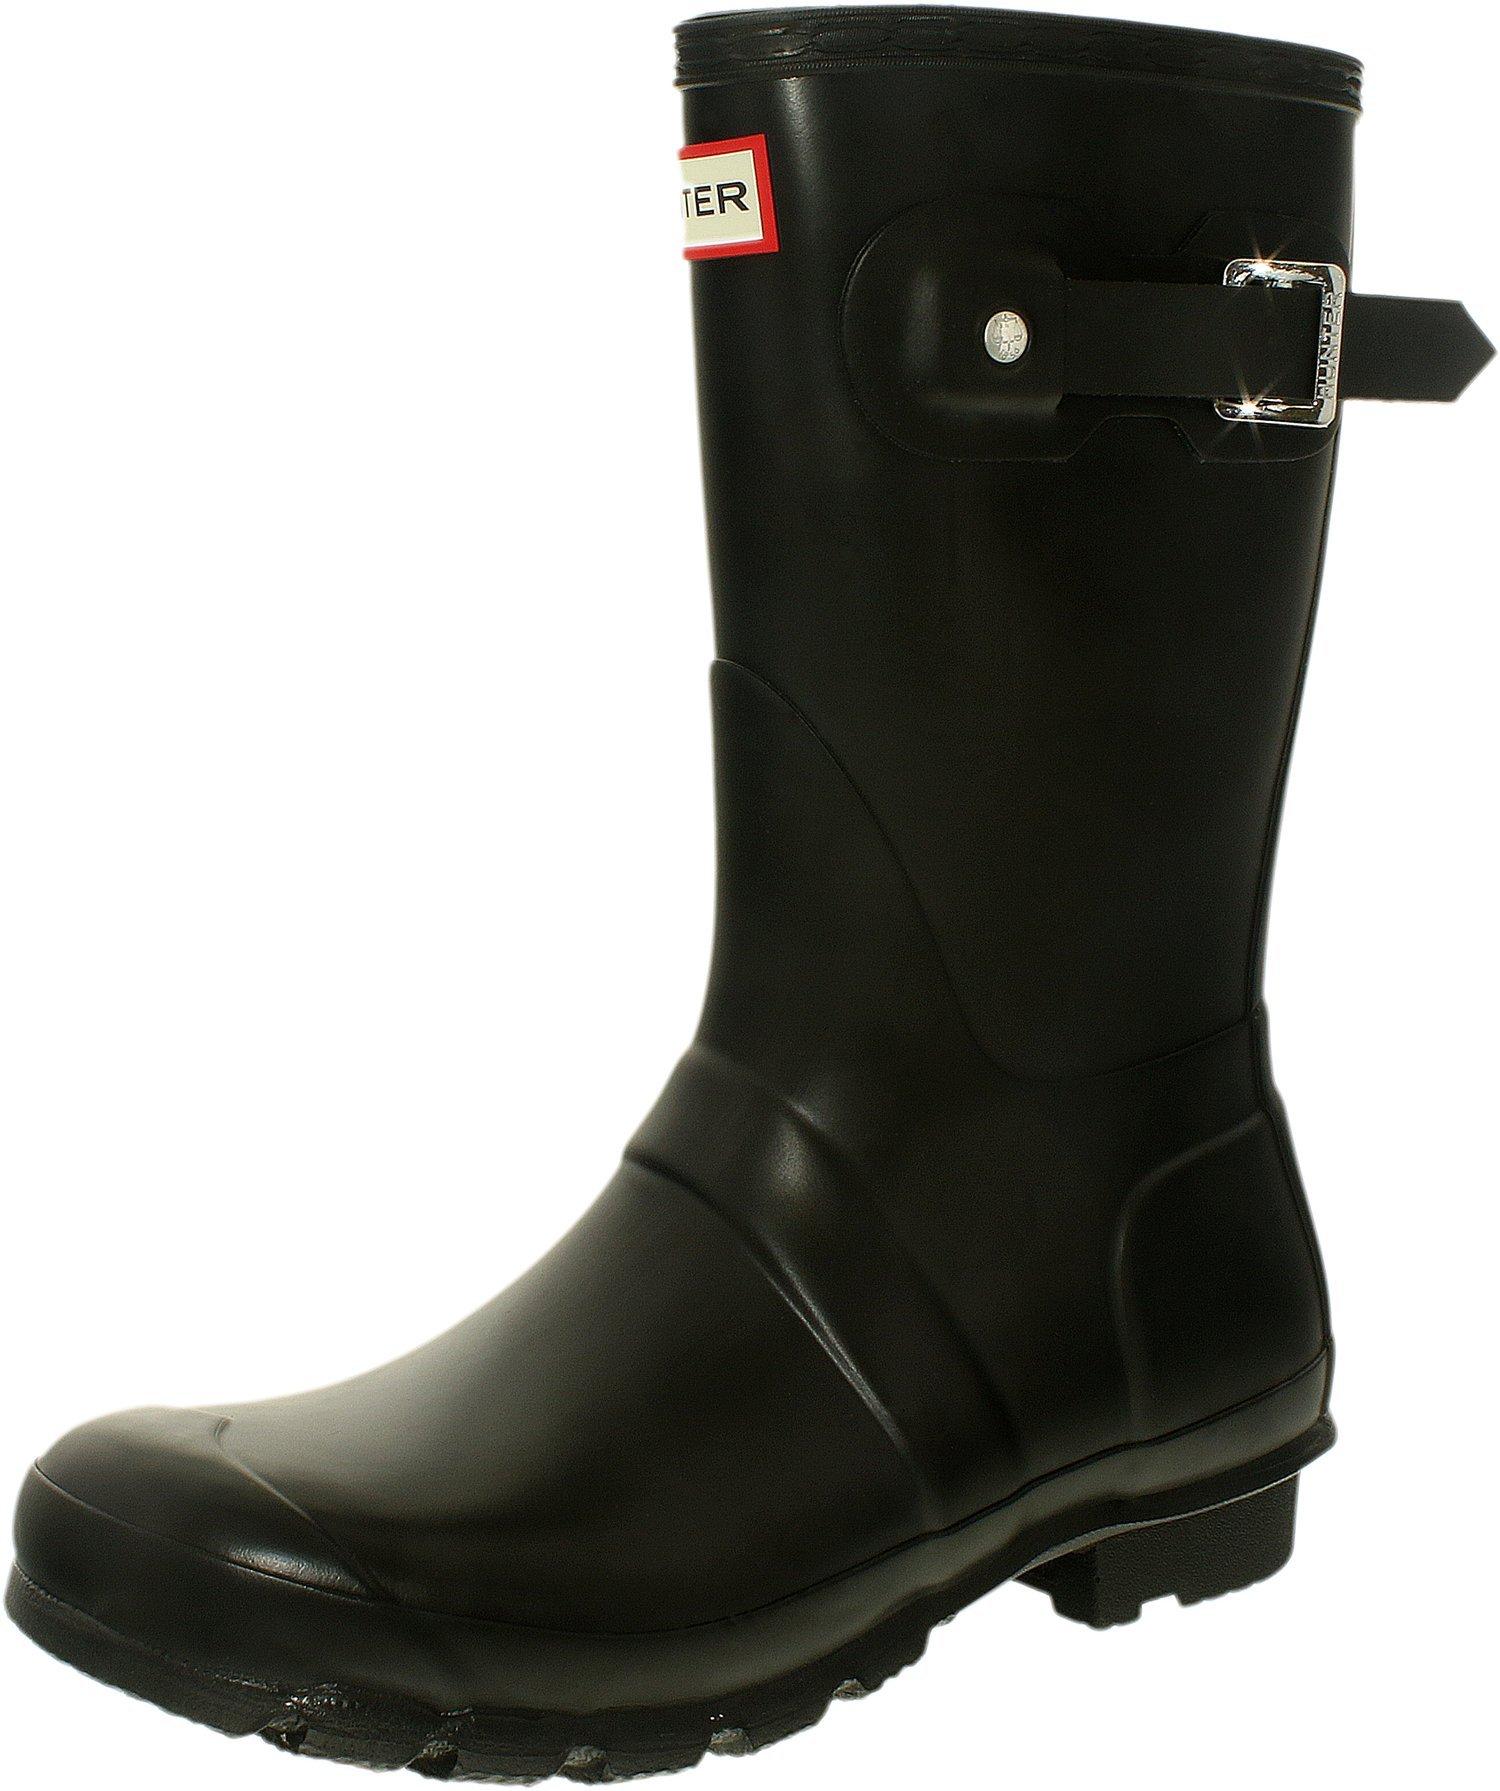 Hunter Women's Original Short Black Mid-Calf Rubber Rain Boot - 7M